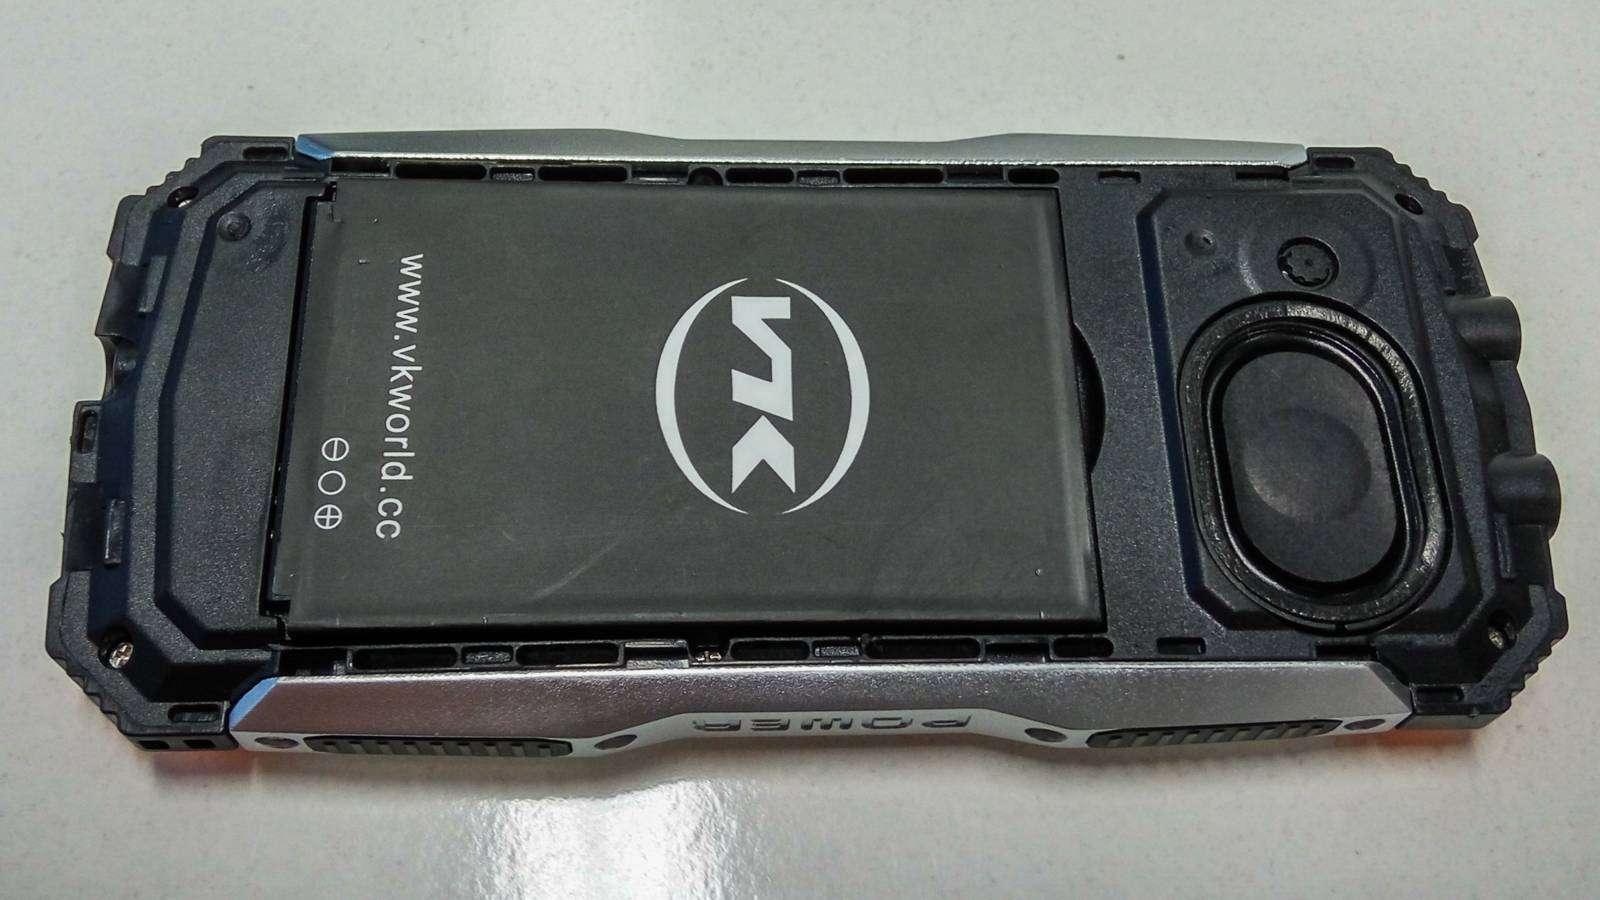 Aliexpress: VKworld Stone V3S обзор телефона с претензией на вездеходность